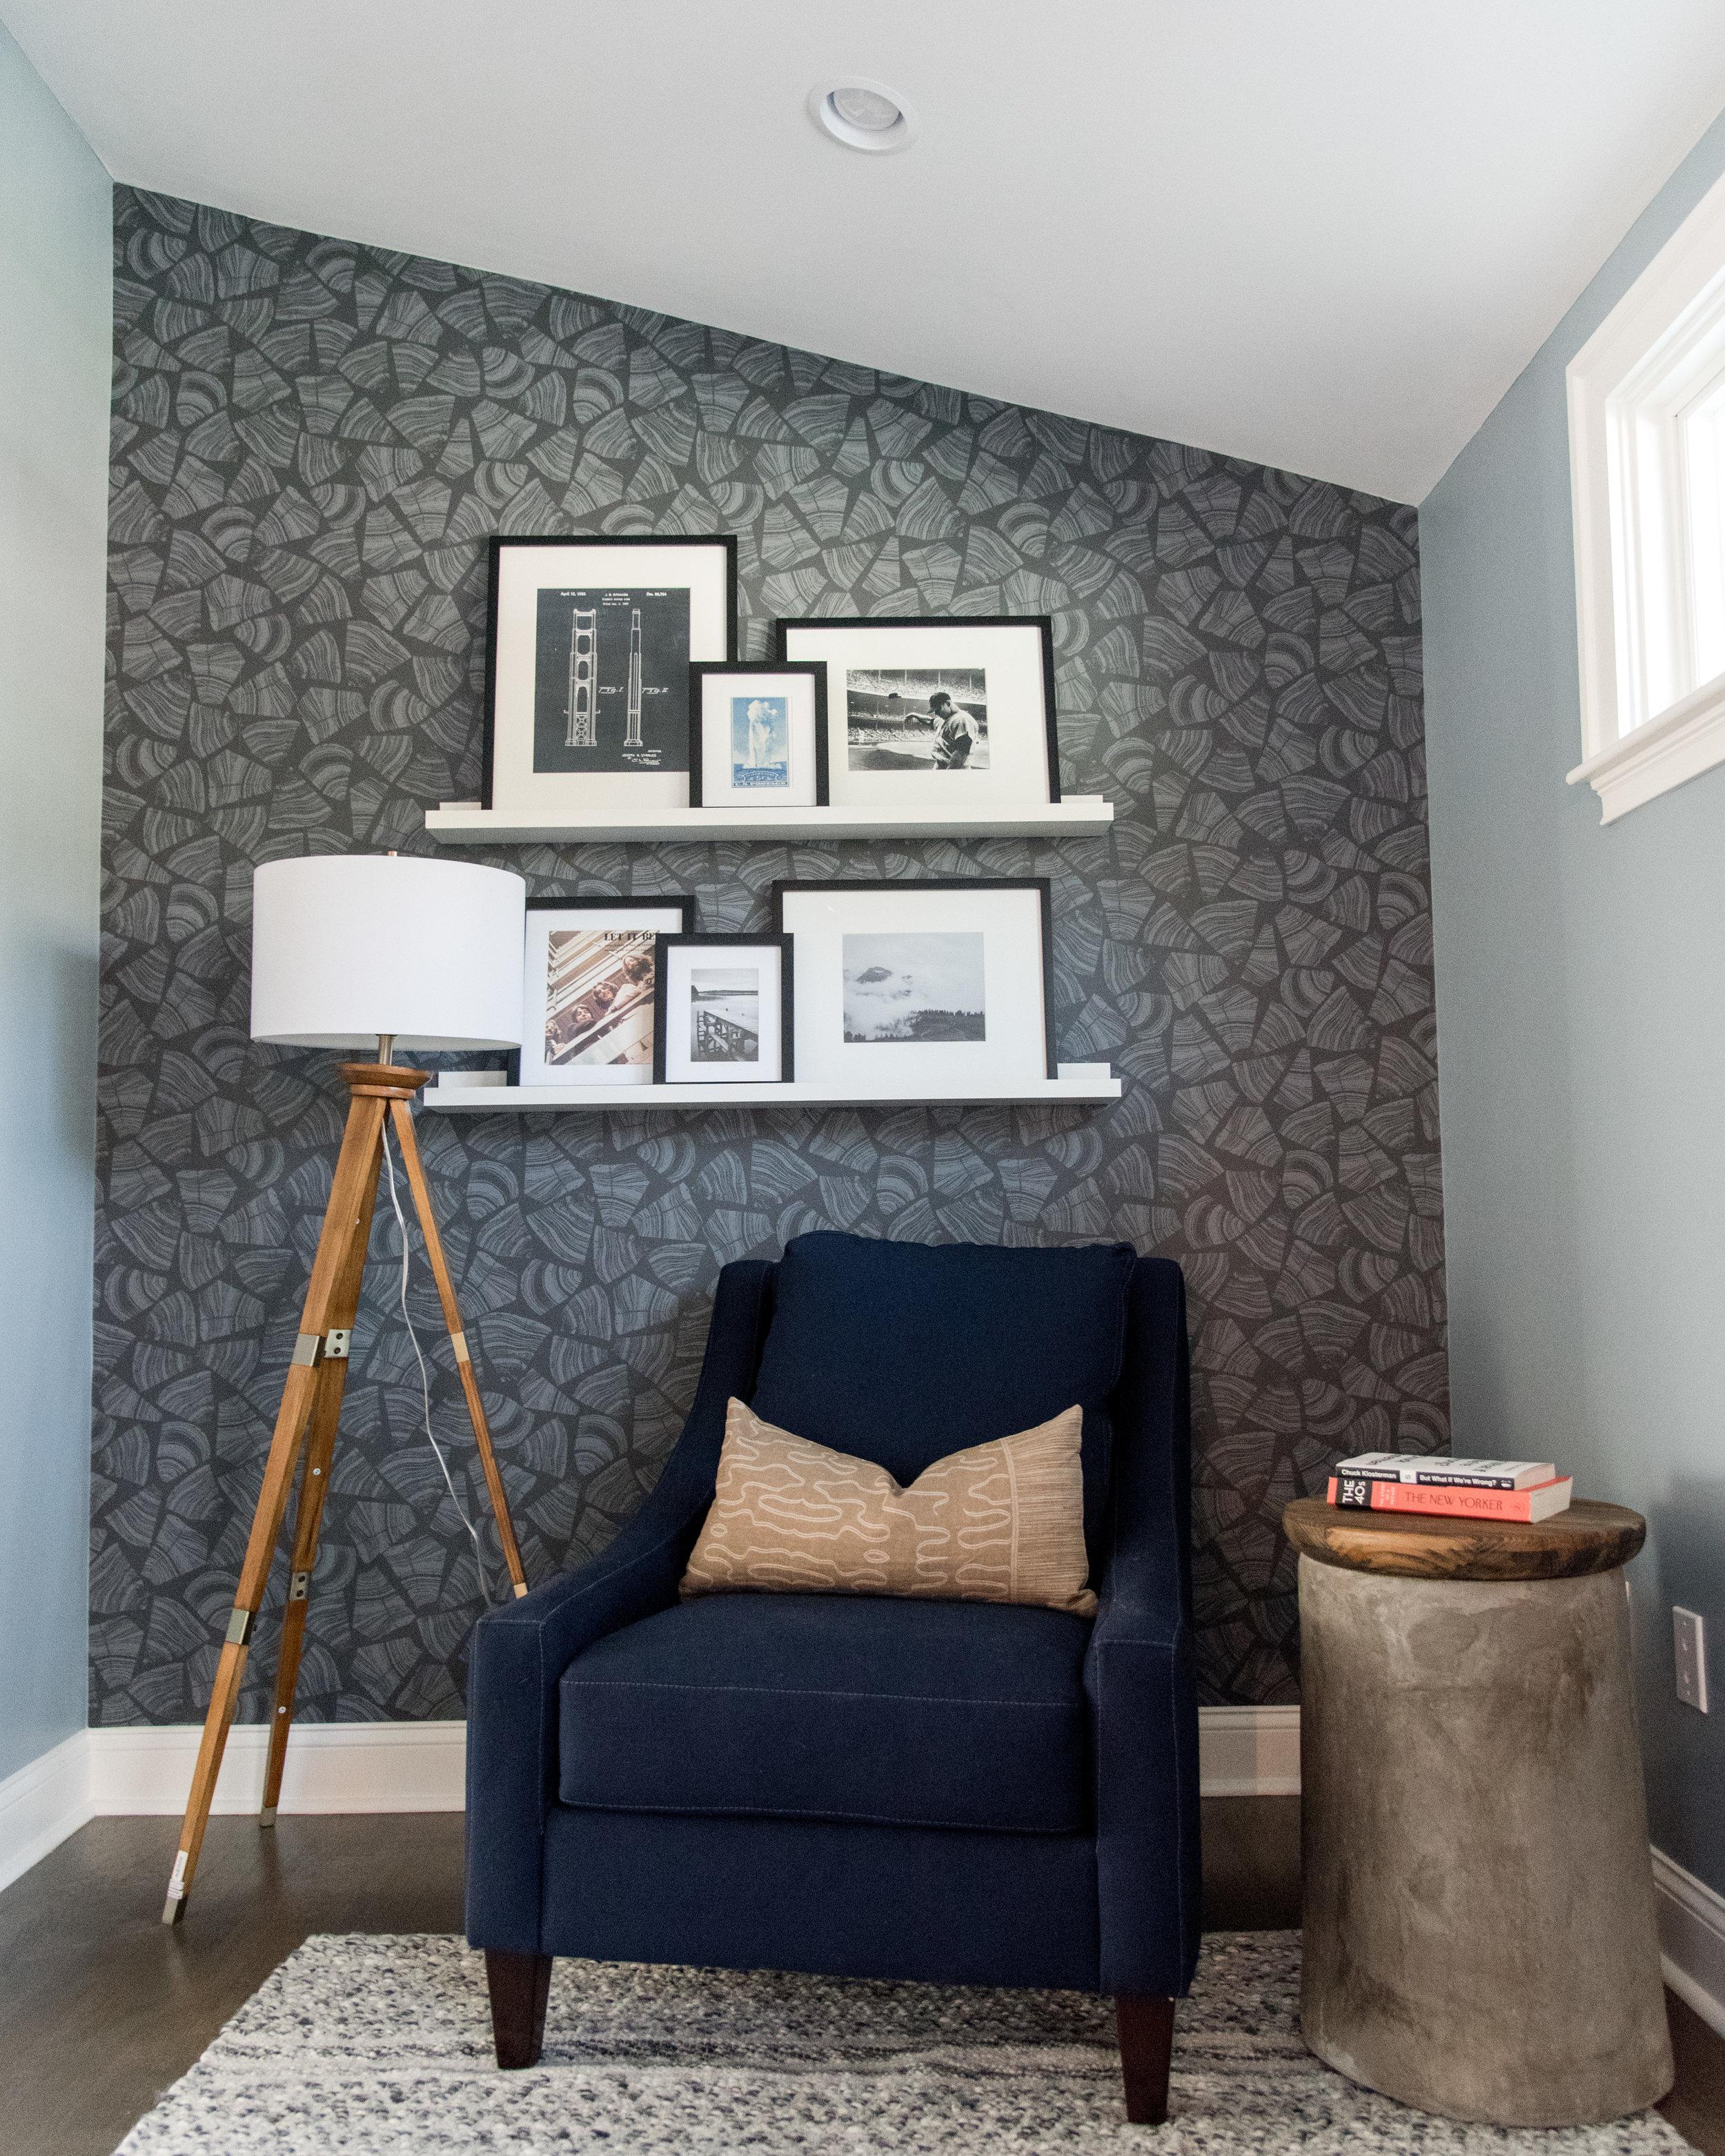 Interior Design Newton Massachusetts decor interior designer Gina Baran Library Room Design